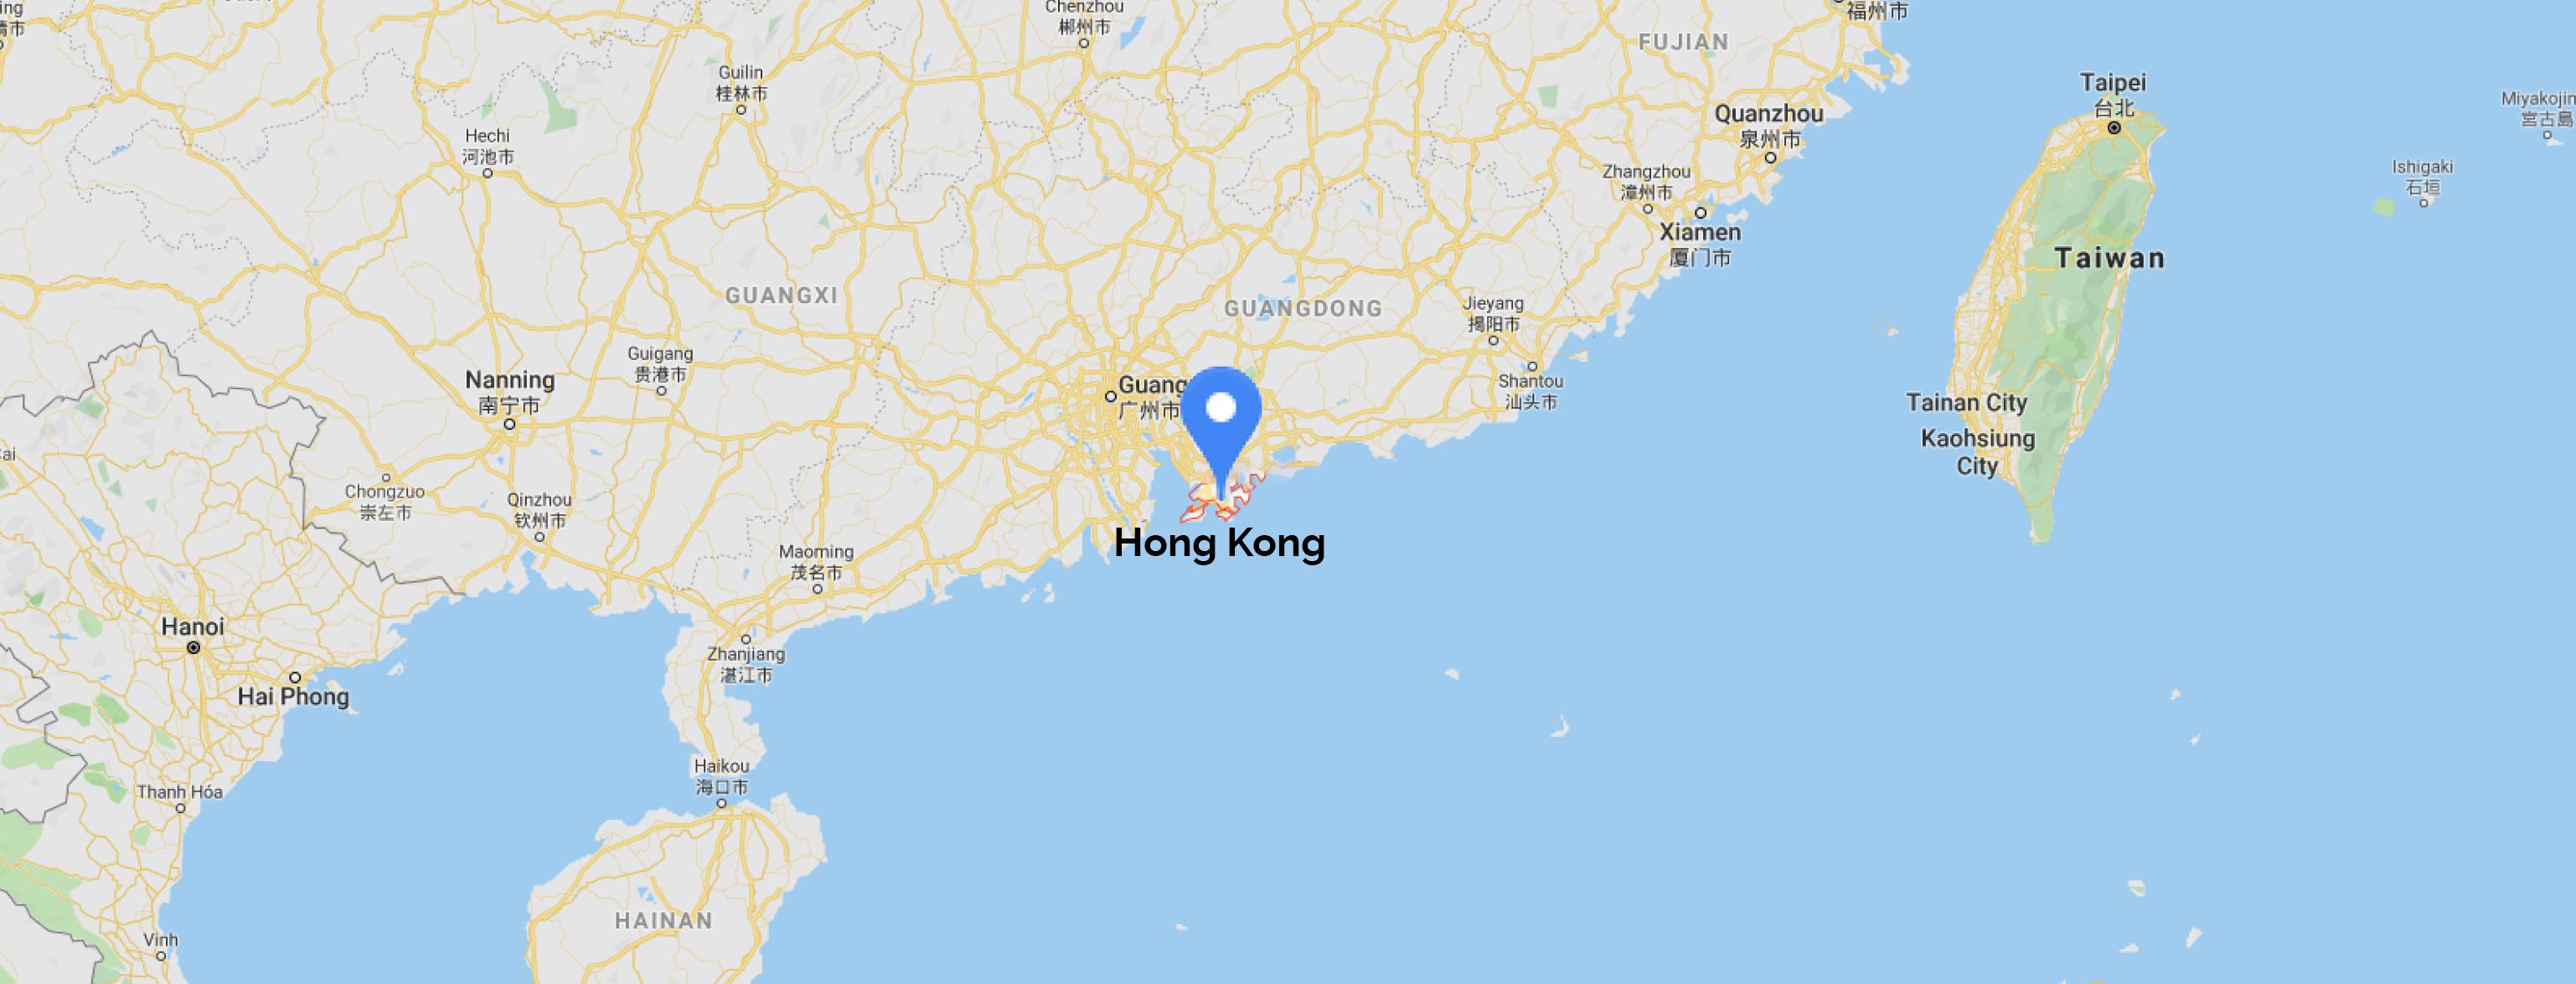 hongkong map